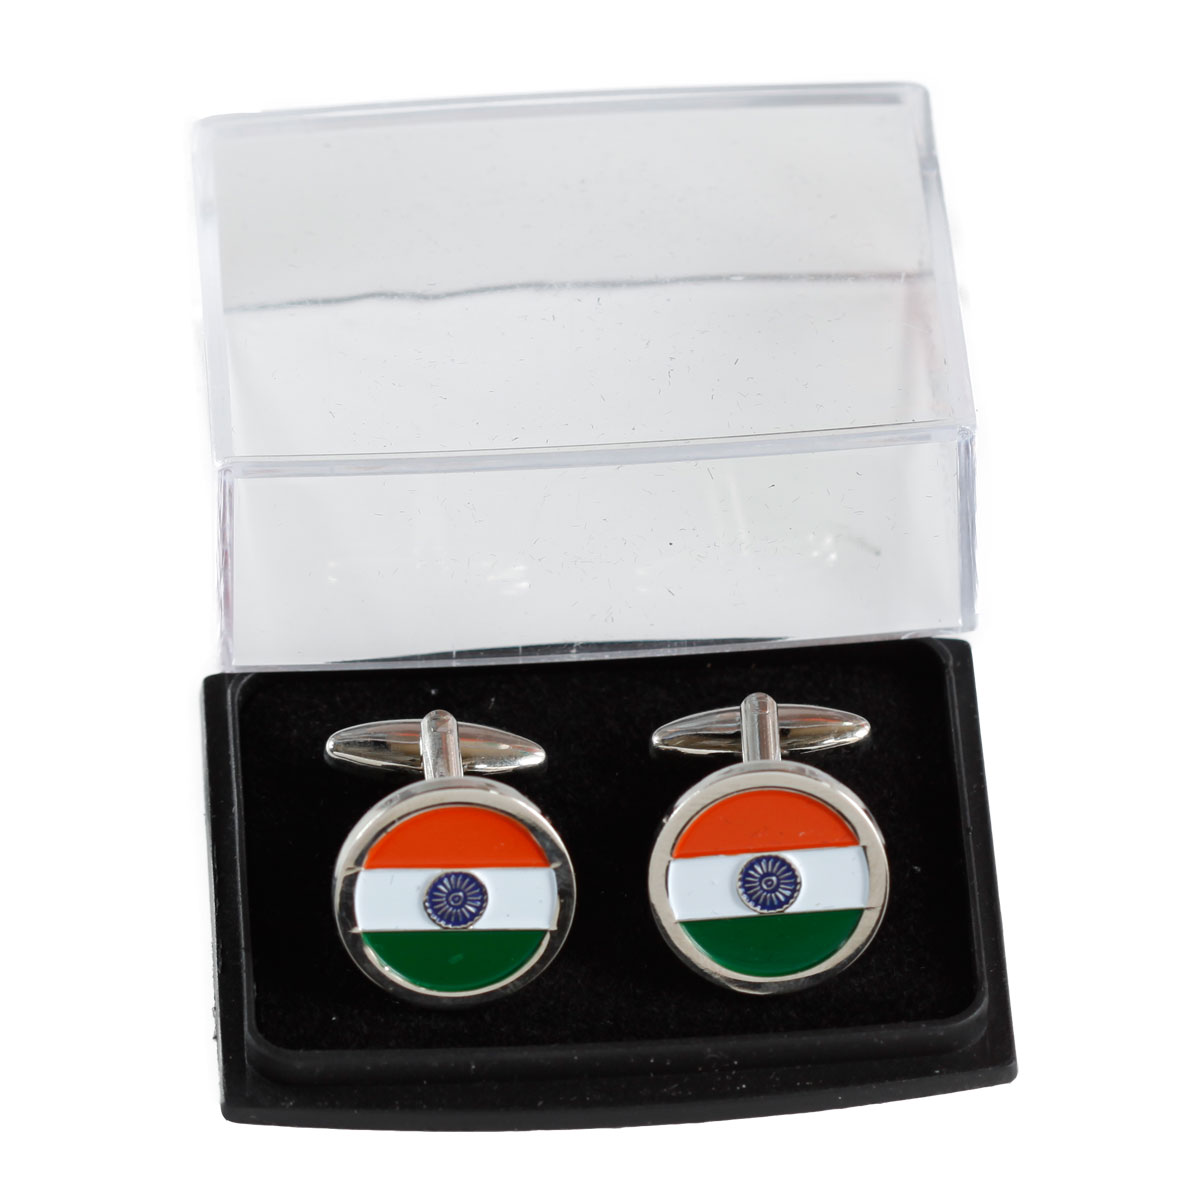 Indian Flag Circular Nickel-Plated Brass High Quality Cufflinks for Shirts